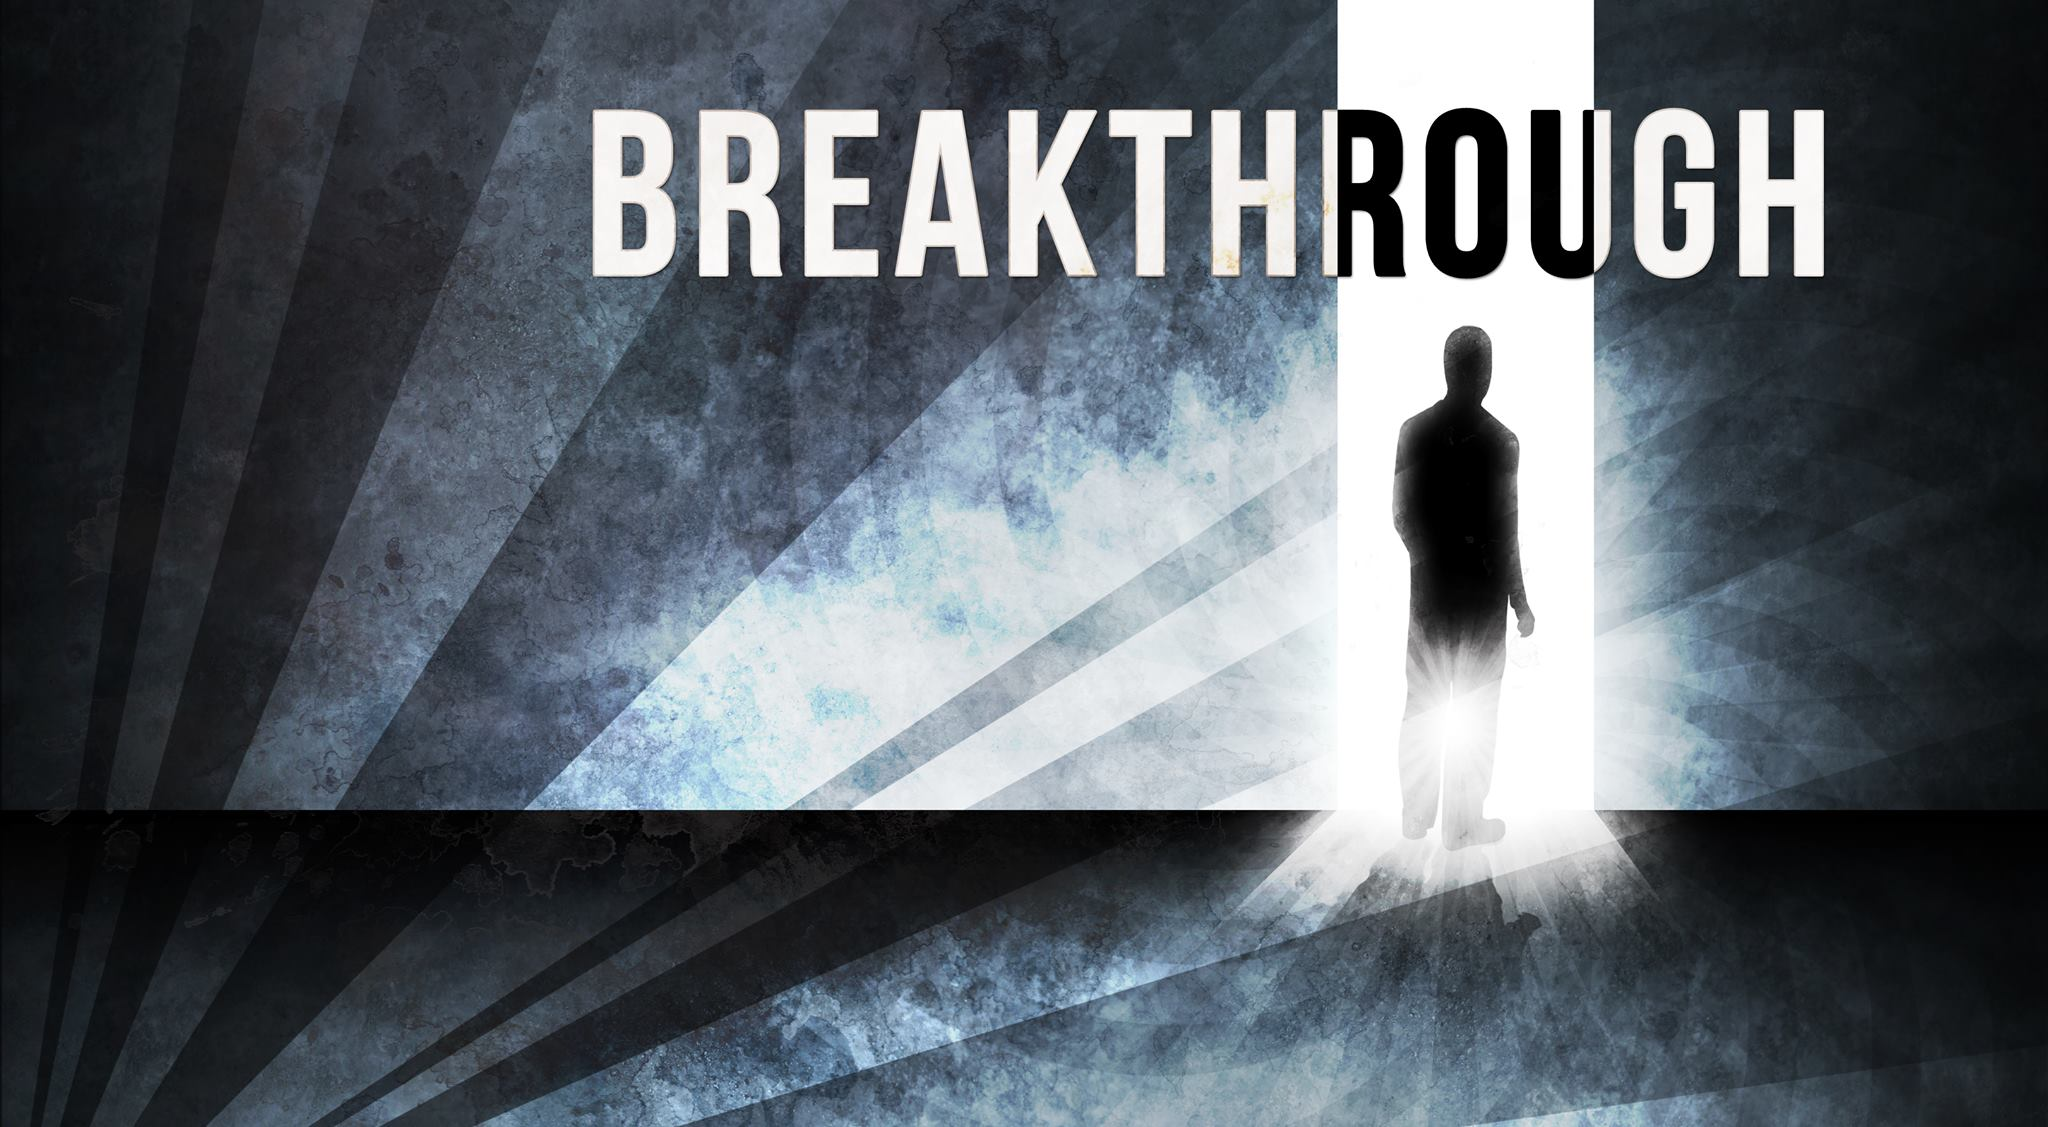 Franklin-Heights-Breakthrough.jpg